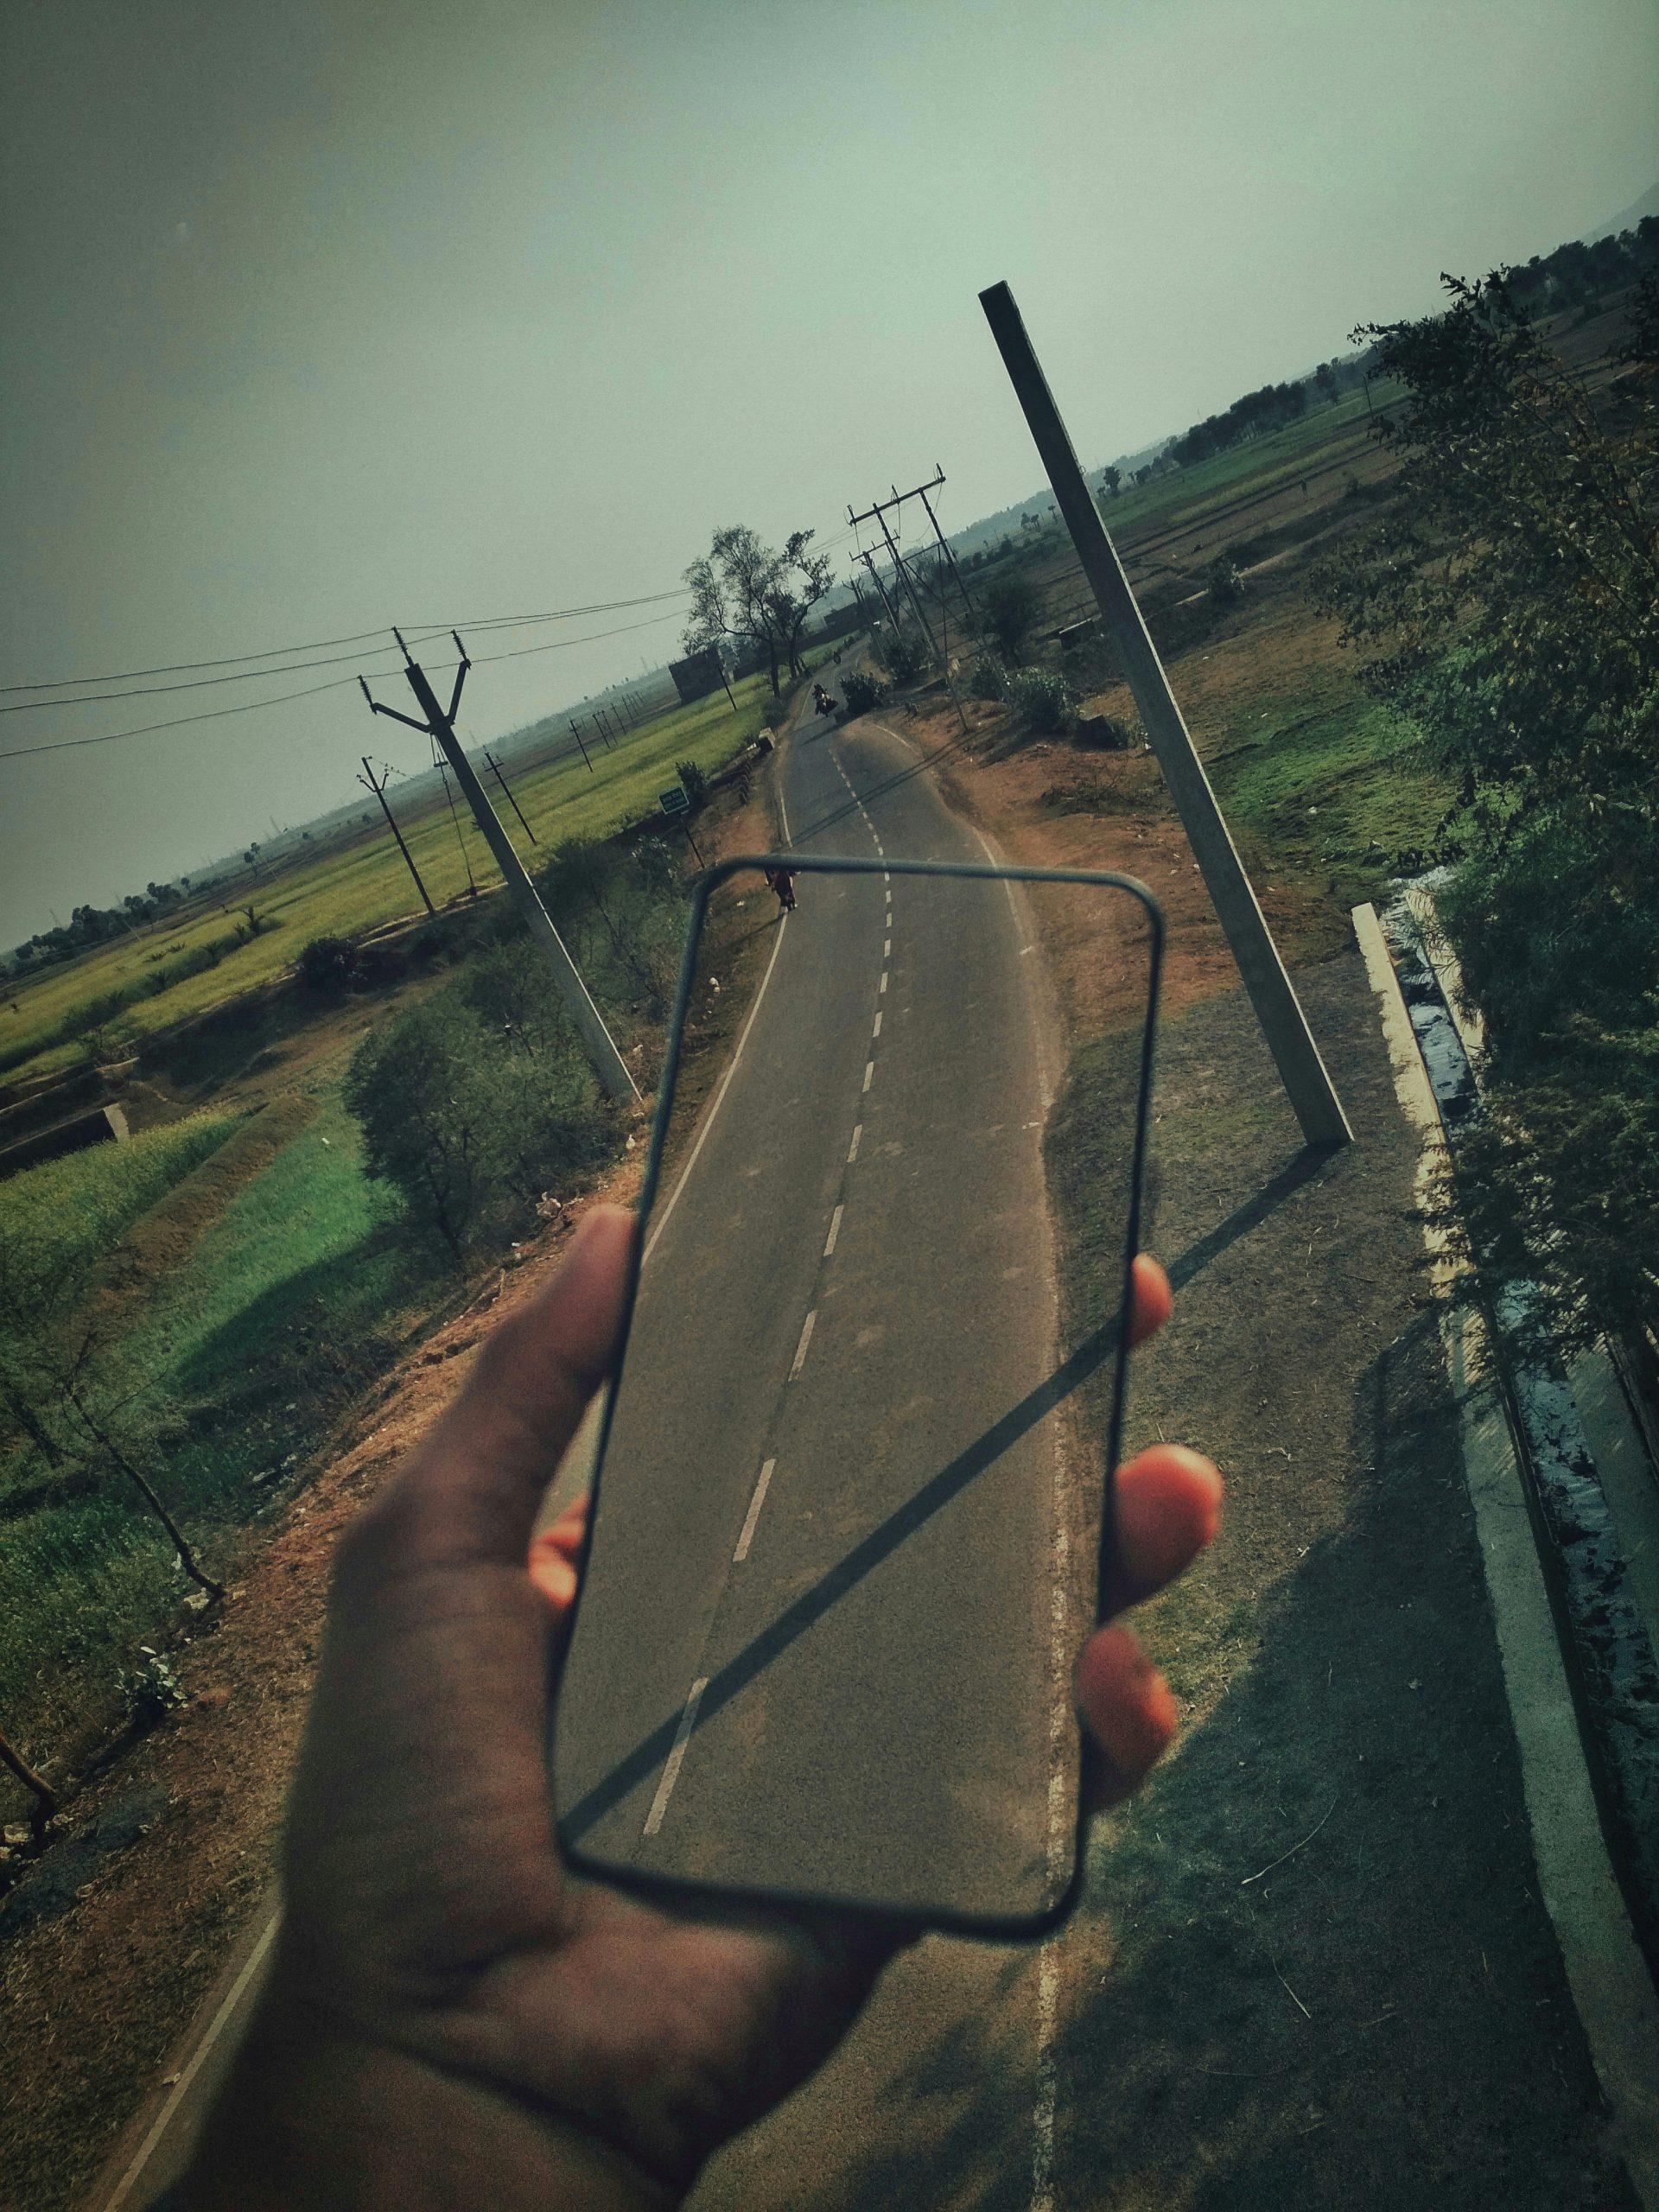 Transparent Phone In Hand